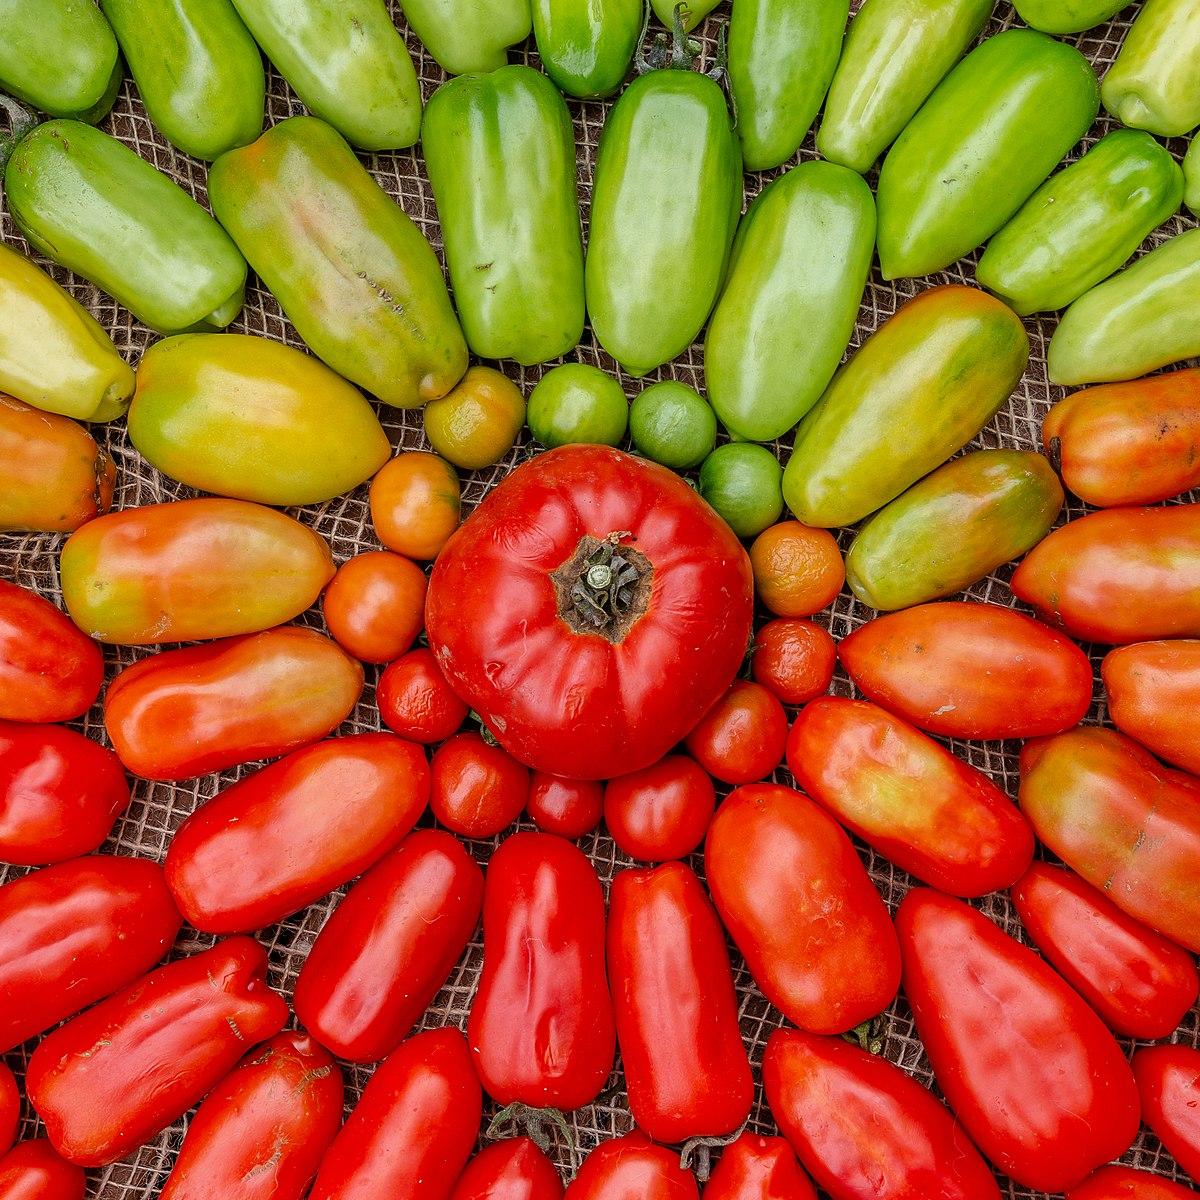 Organic home-grown tomatoes - unripe to ripe.jpg